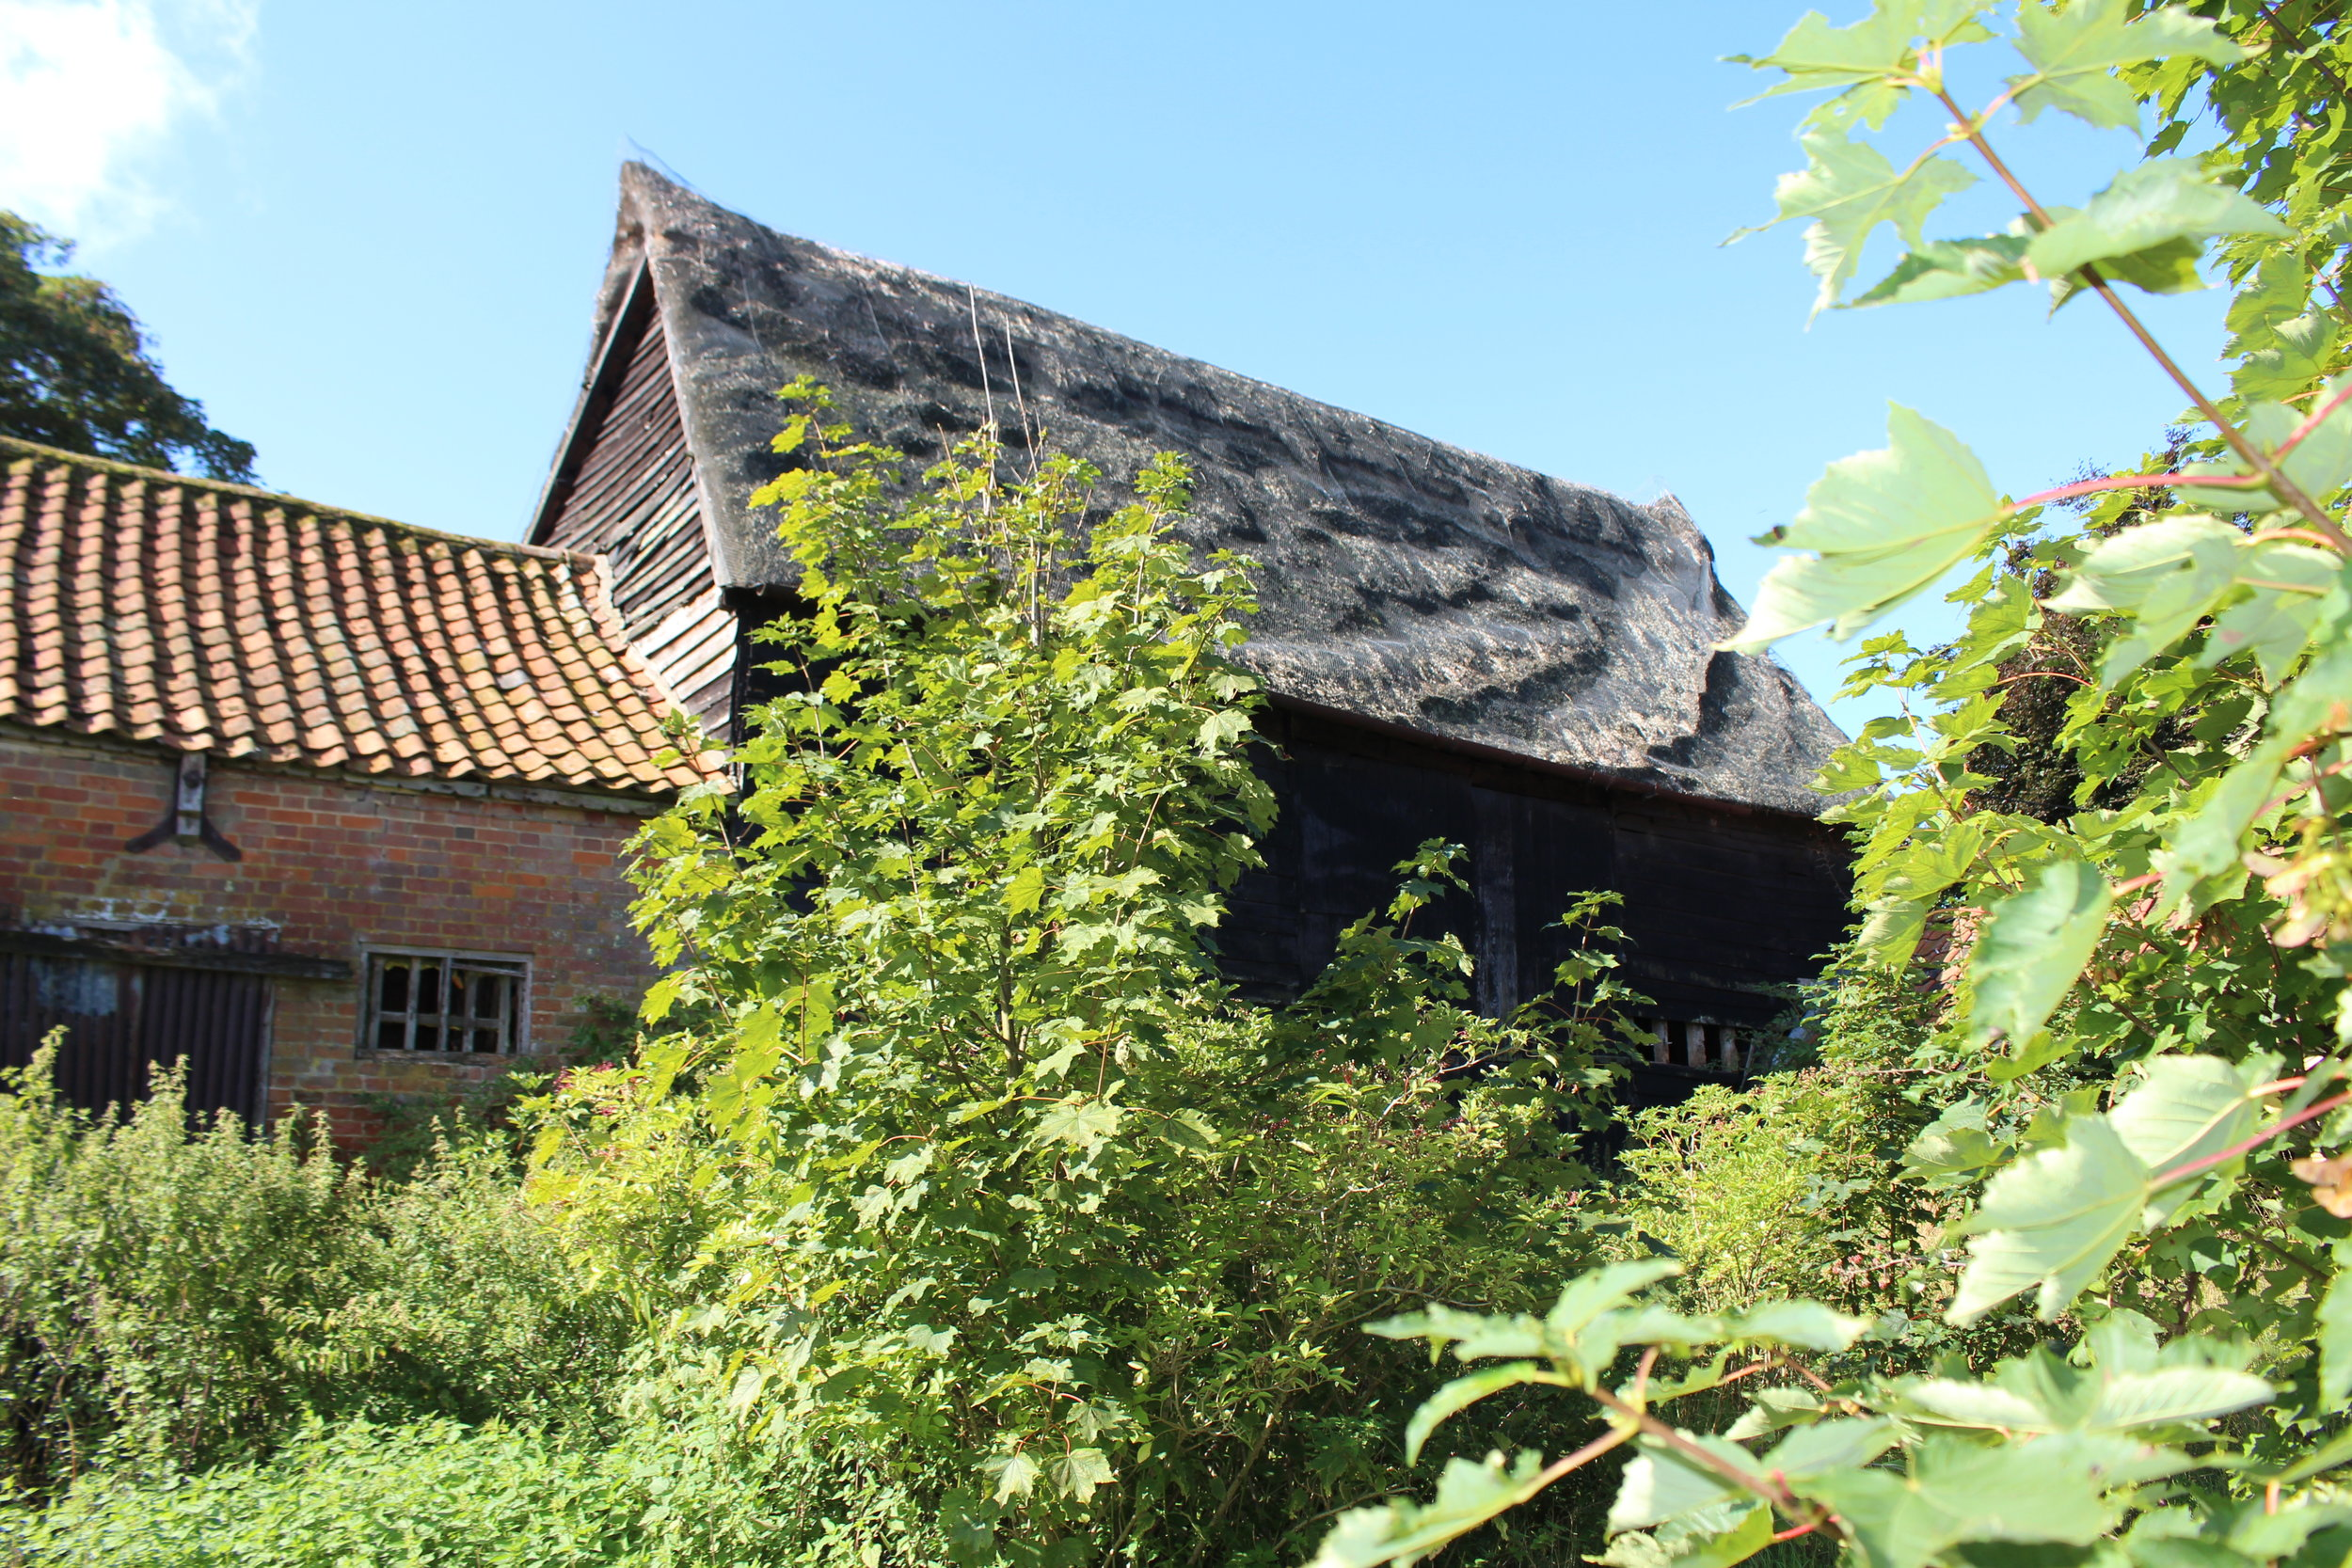 Whitehouse Farm, Mill Rd, Wissett, Suffolk. C1. Barn (67).JPG